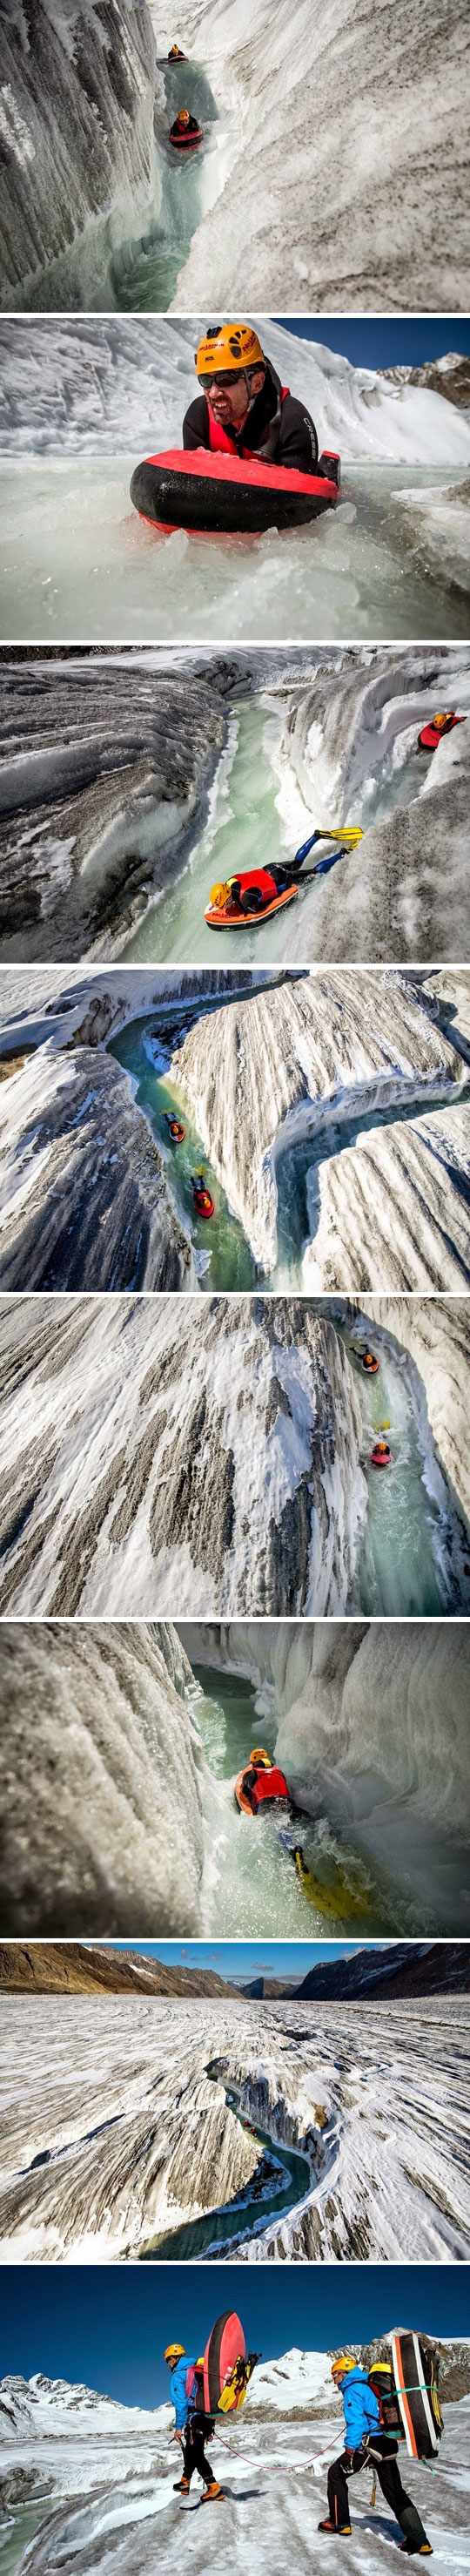 glacier-water-slide-fun